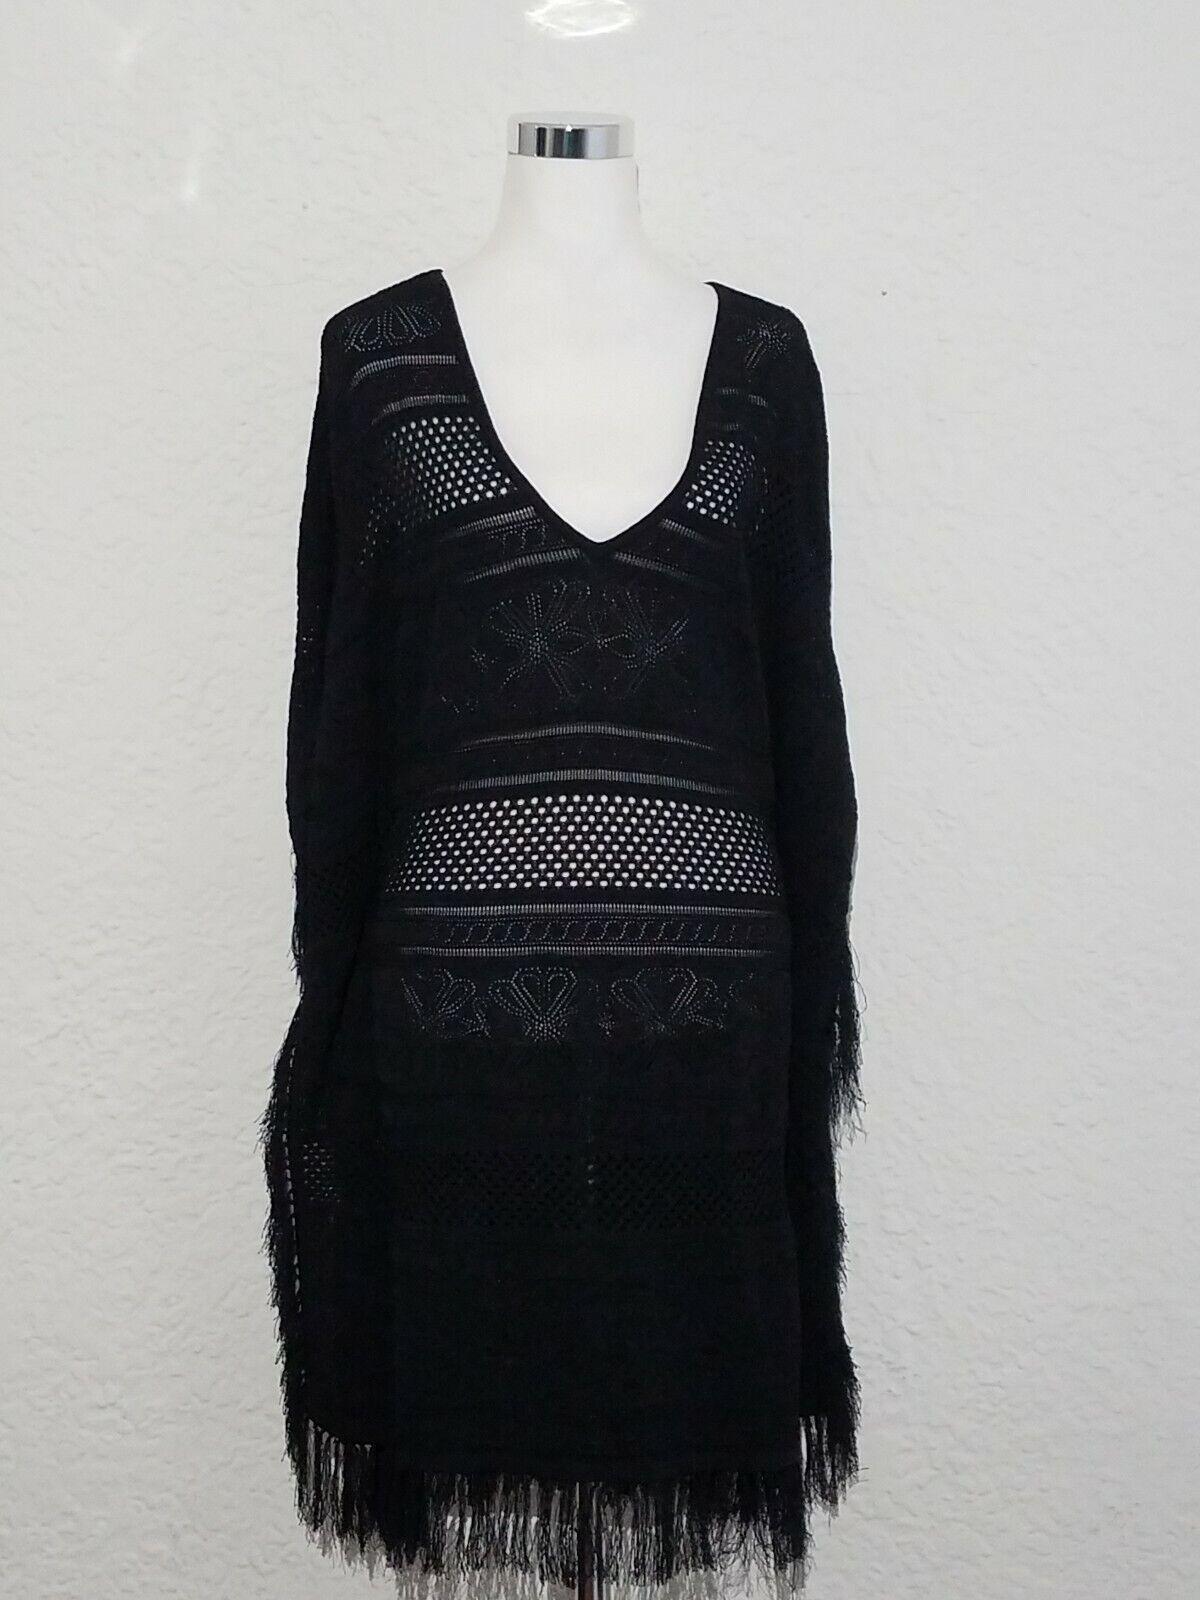 ELIE TAHARI WOMAN'S PONCHO KNIT COVER FRINGE DRESS Größe   8